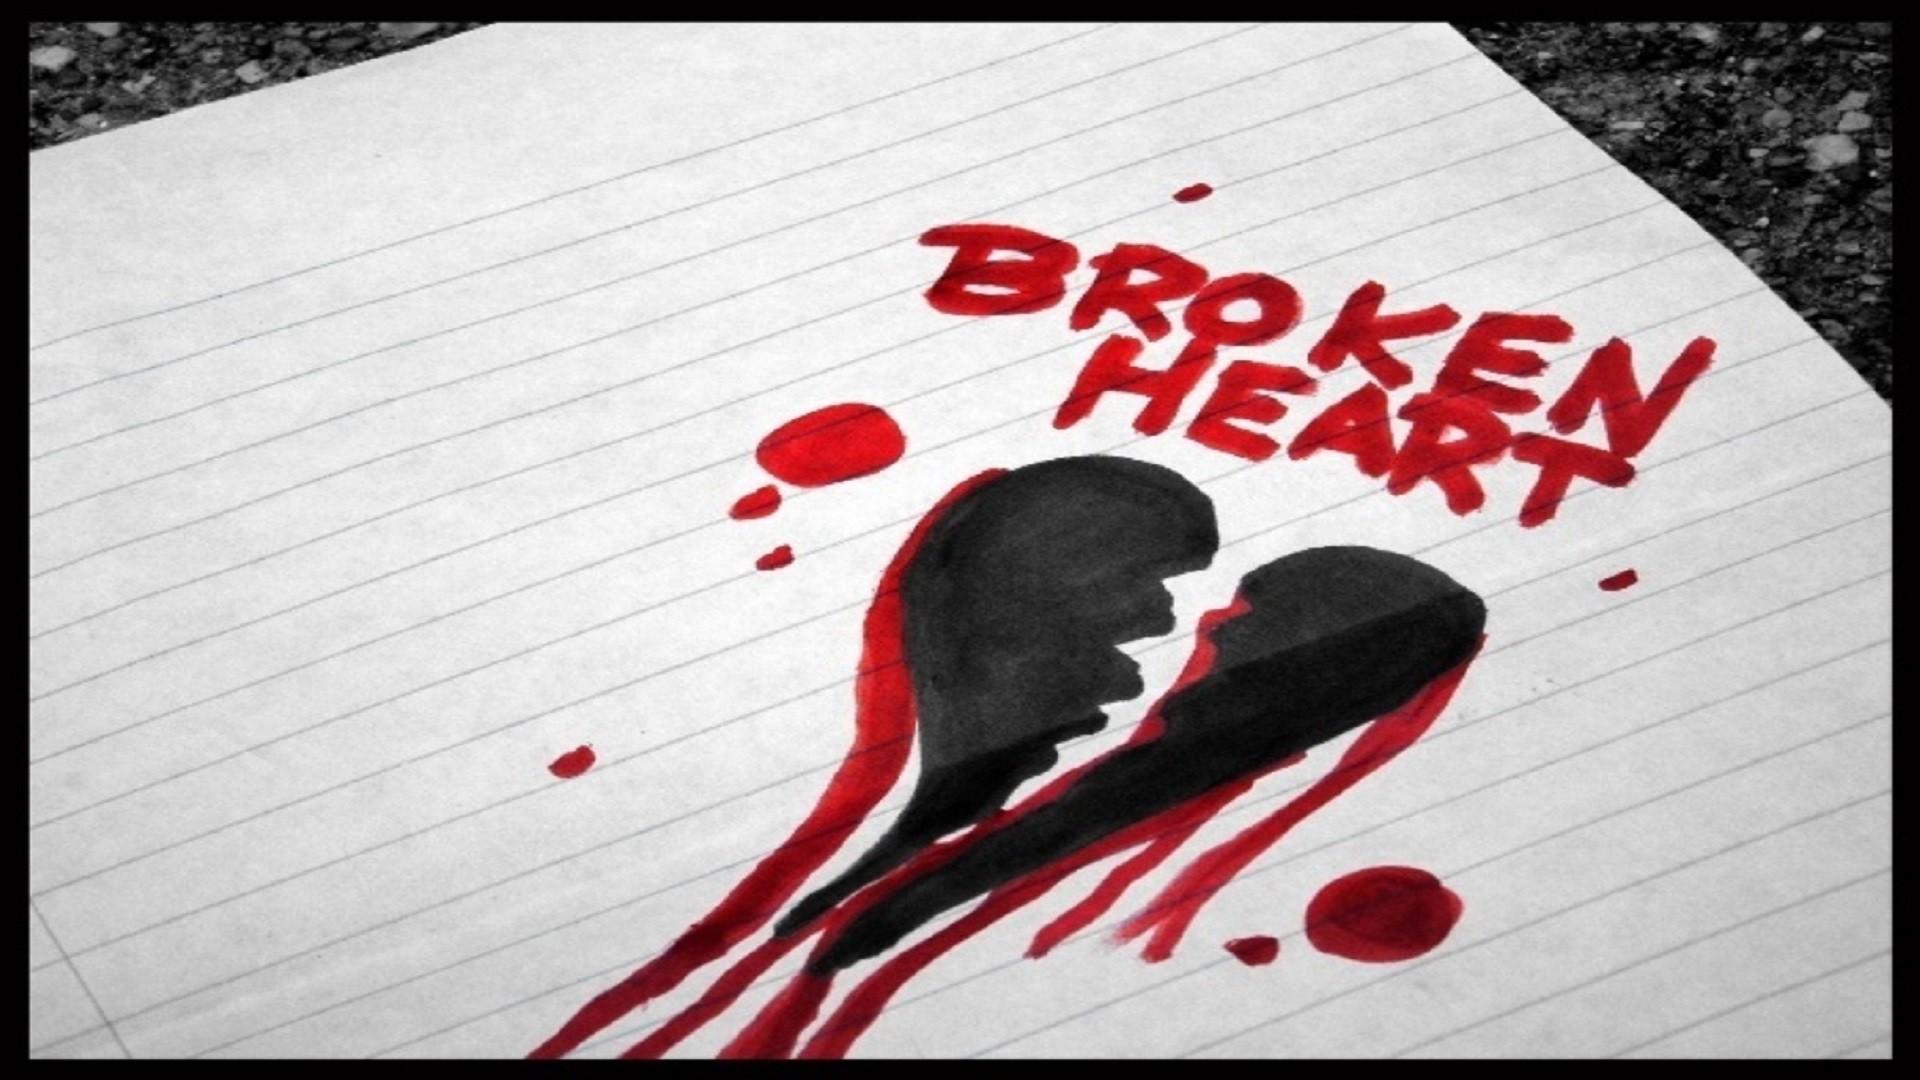 1920x1080, You Make Me Broken Heart Hd Free Wallpapers - Broken Heart Pictures For Girls - HD Wallpaper